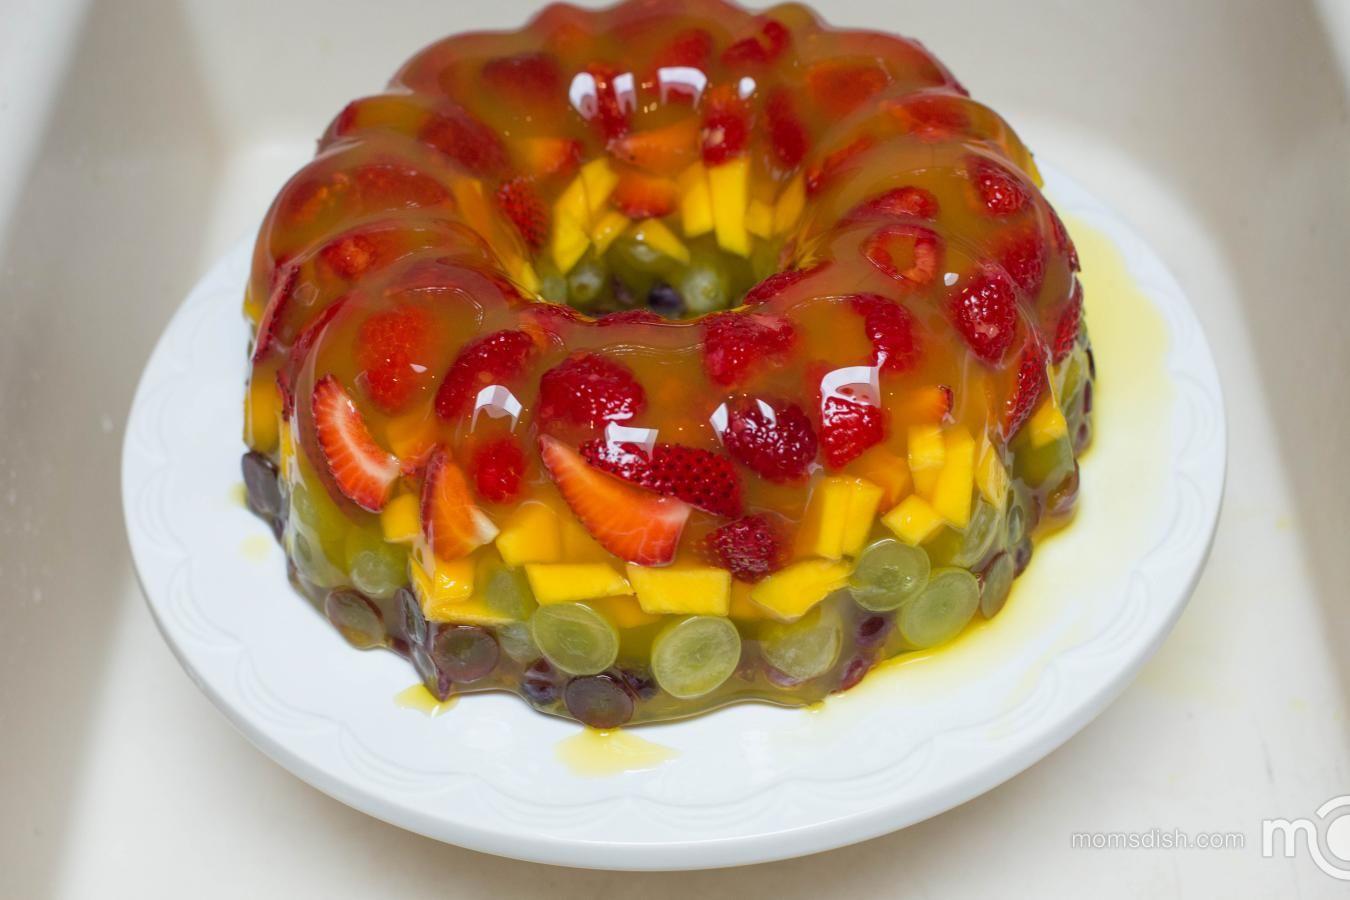 Jello Fruit Cake Dessert Mom S Dish Food Dessert Yes Please